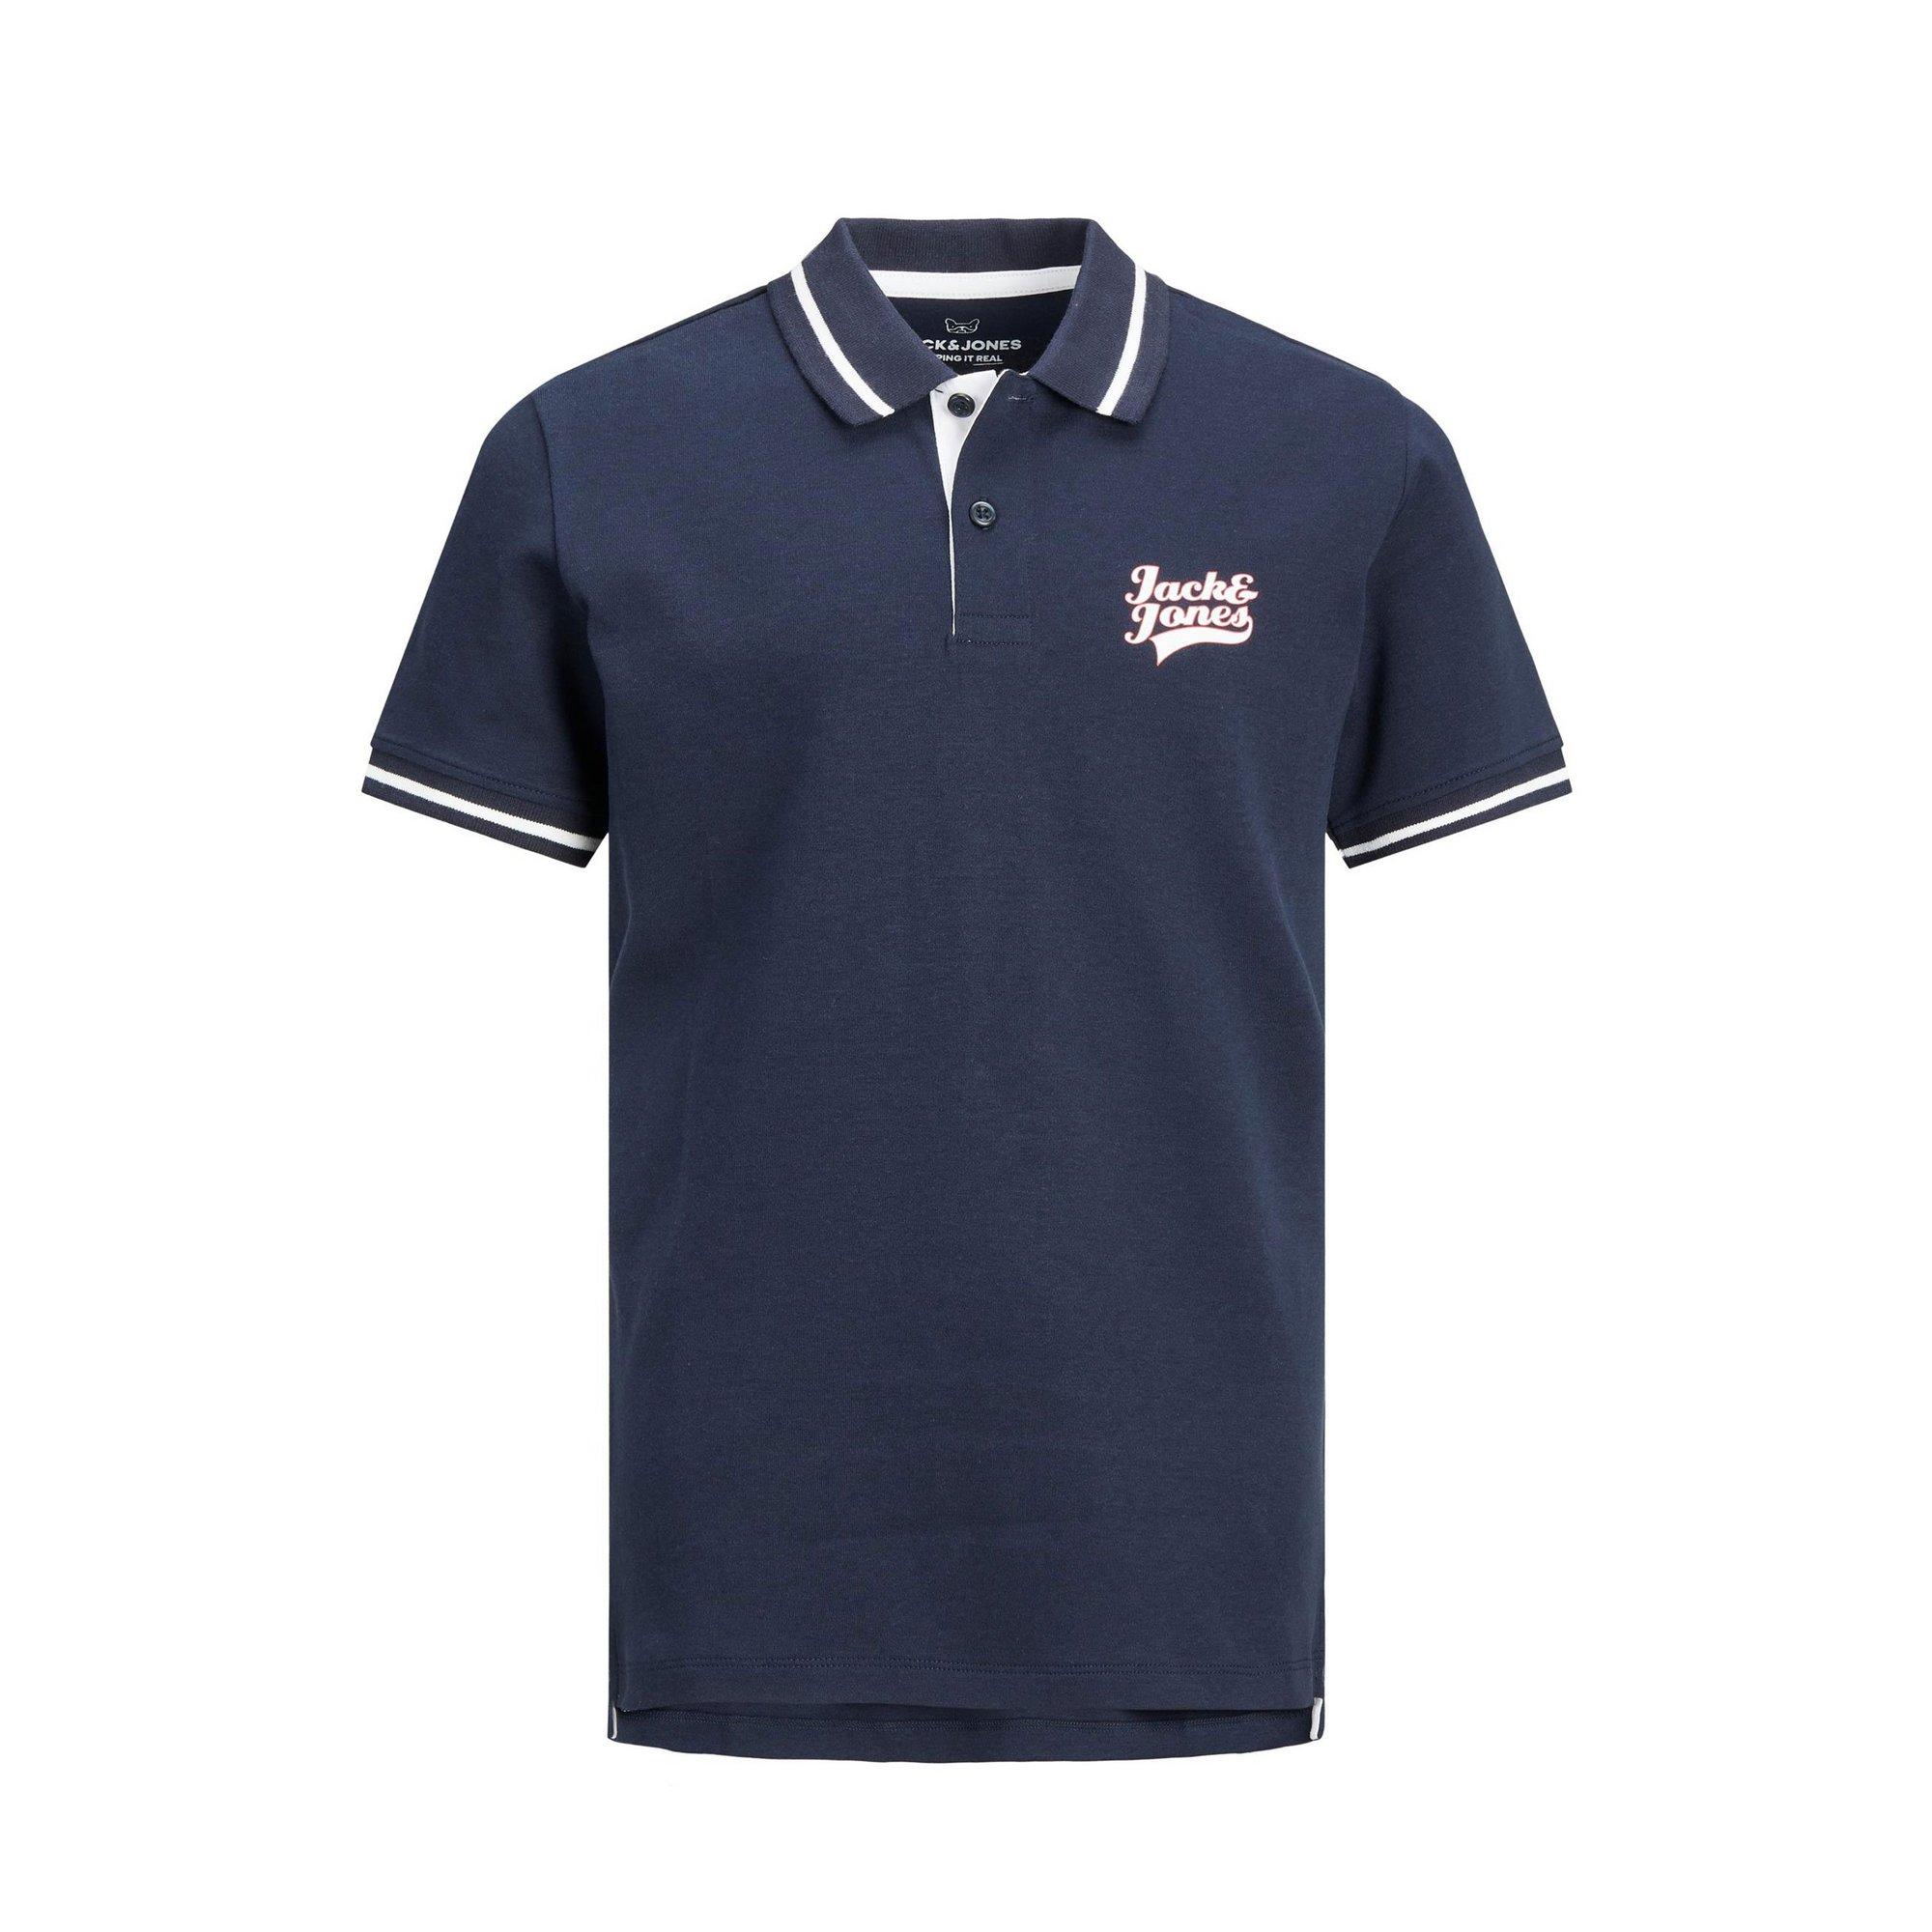 Image of Boys Jack and Jones Navy Polo Shirt